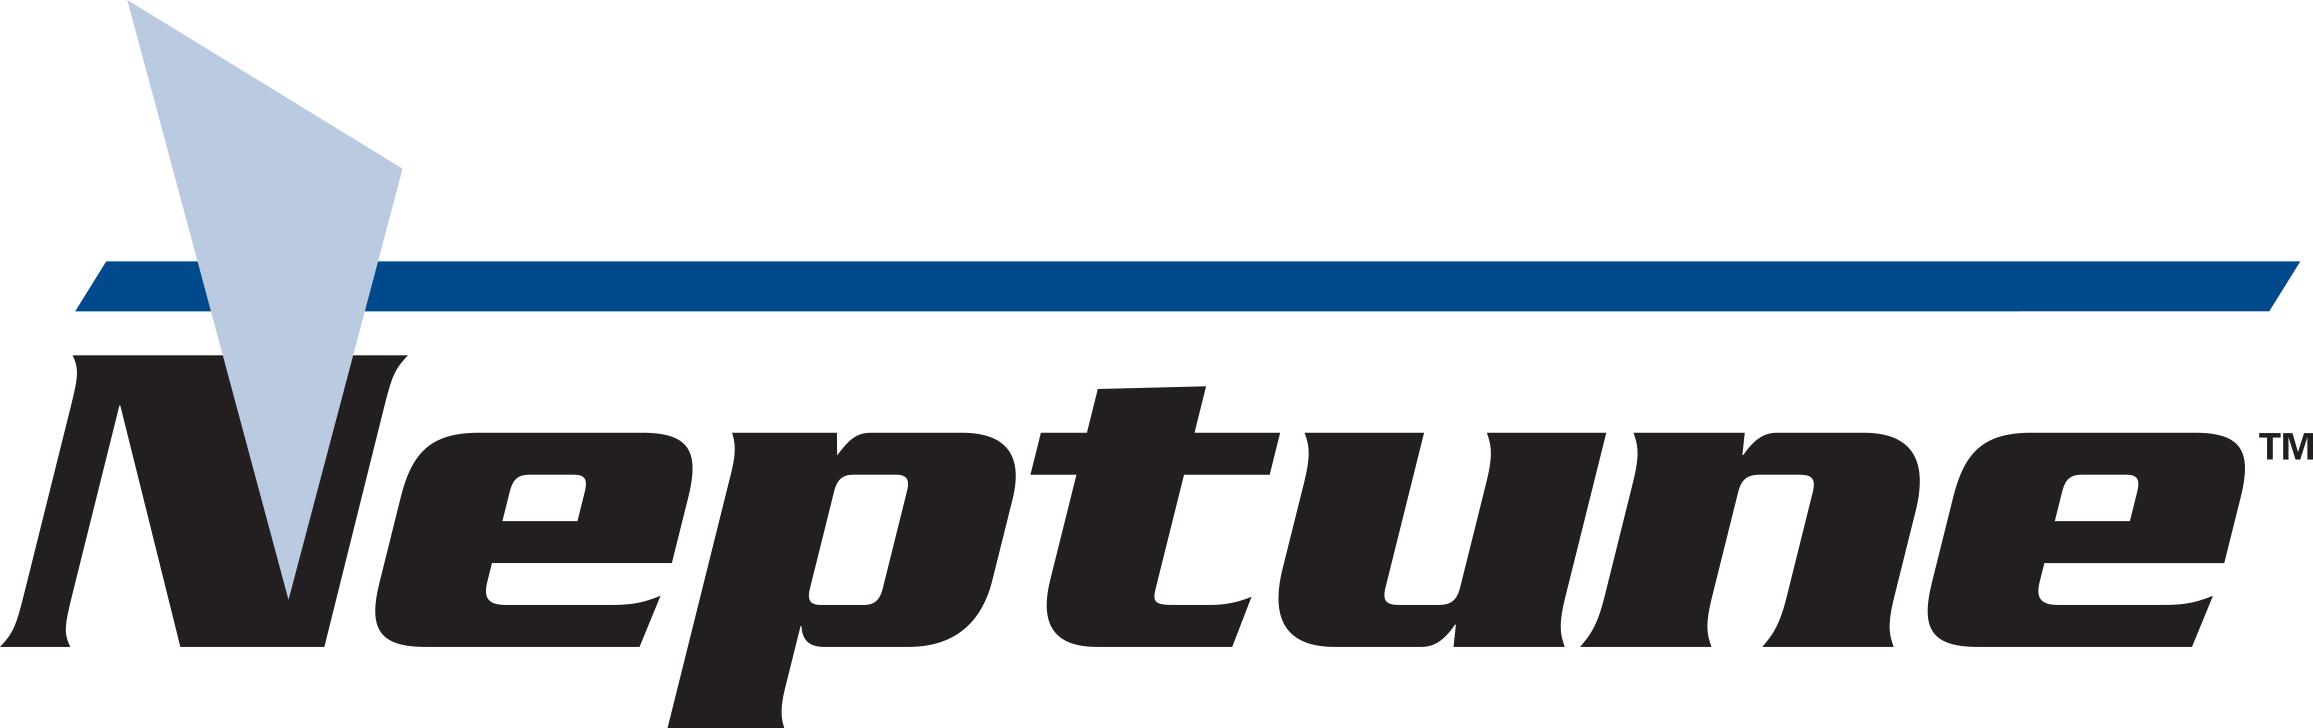 Positive Displacement Pumps Mechanical Equipment Company